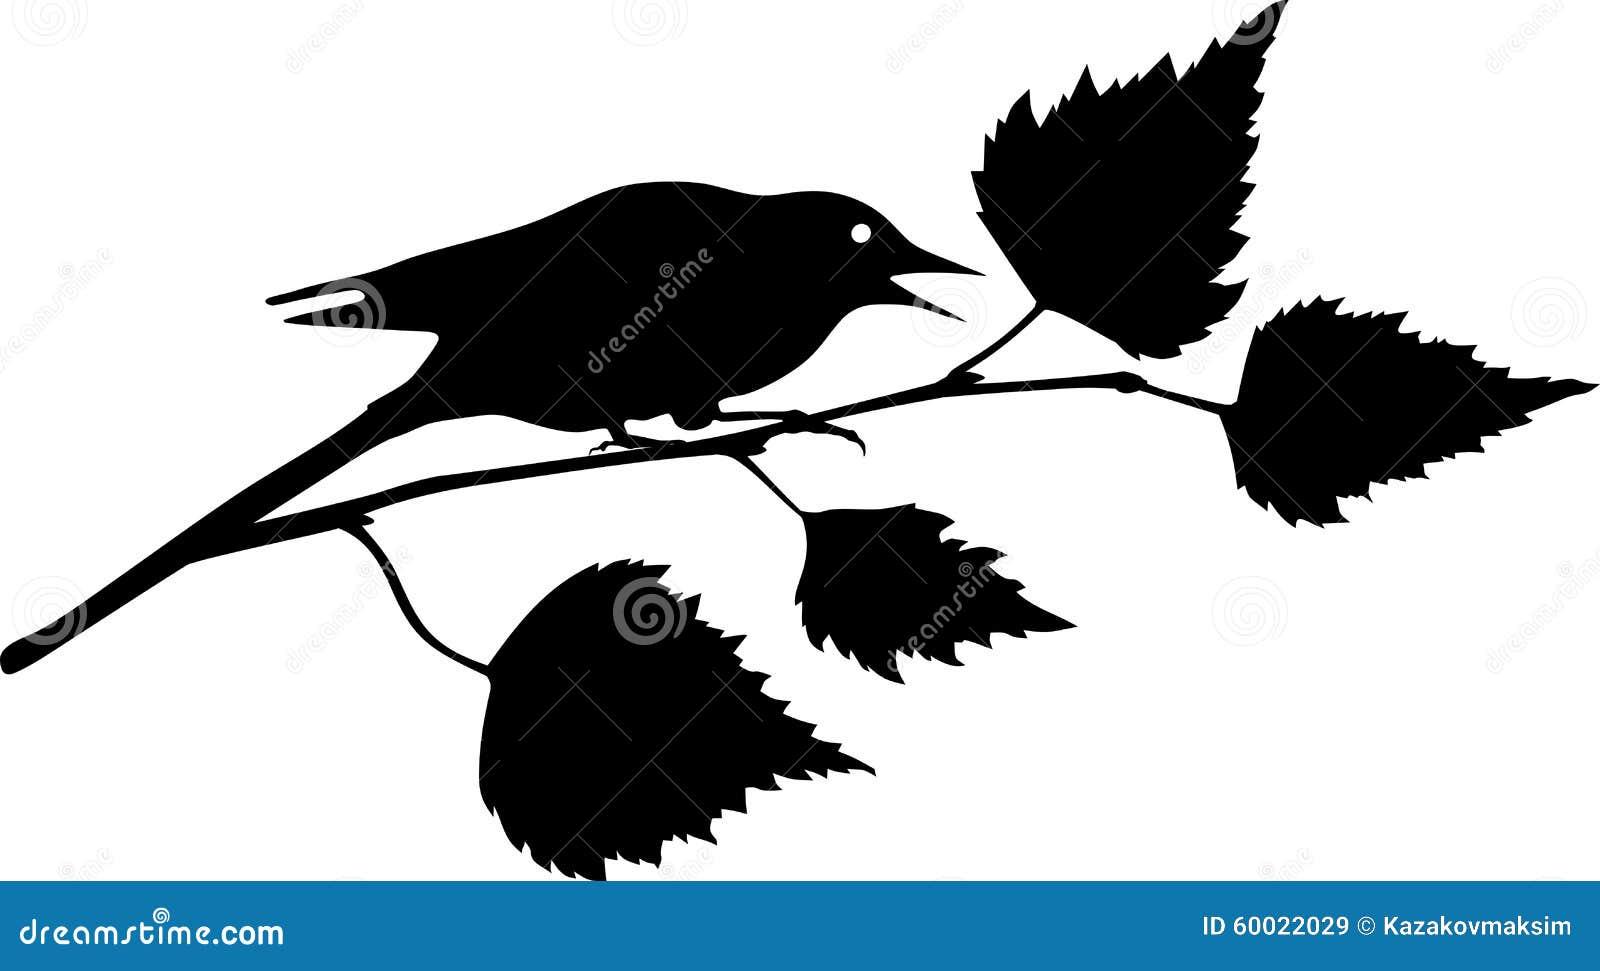 sitting bird silhouette